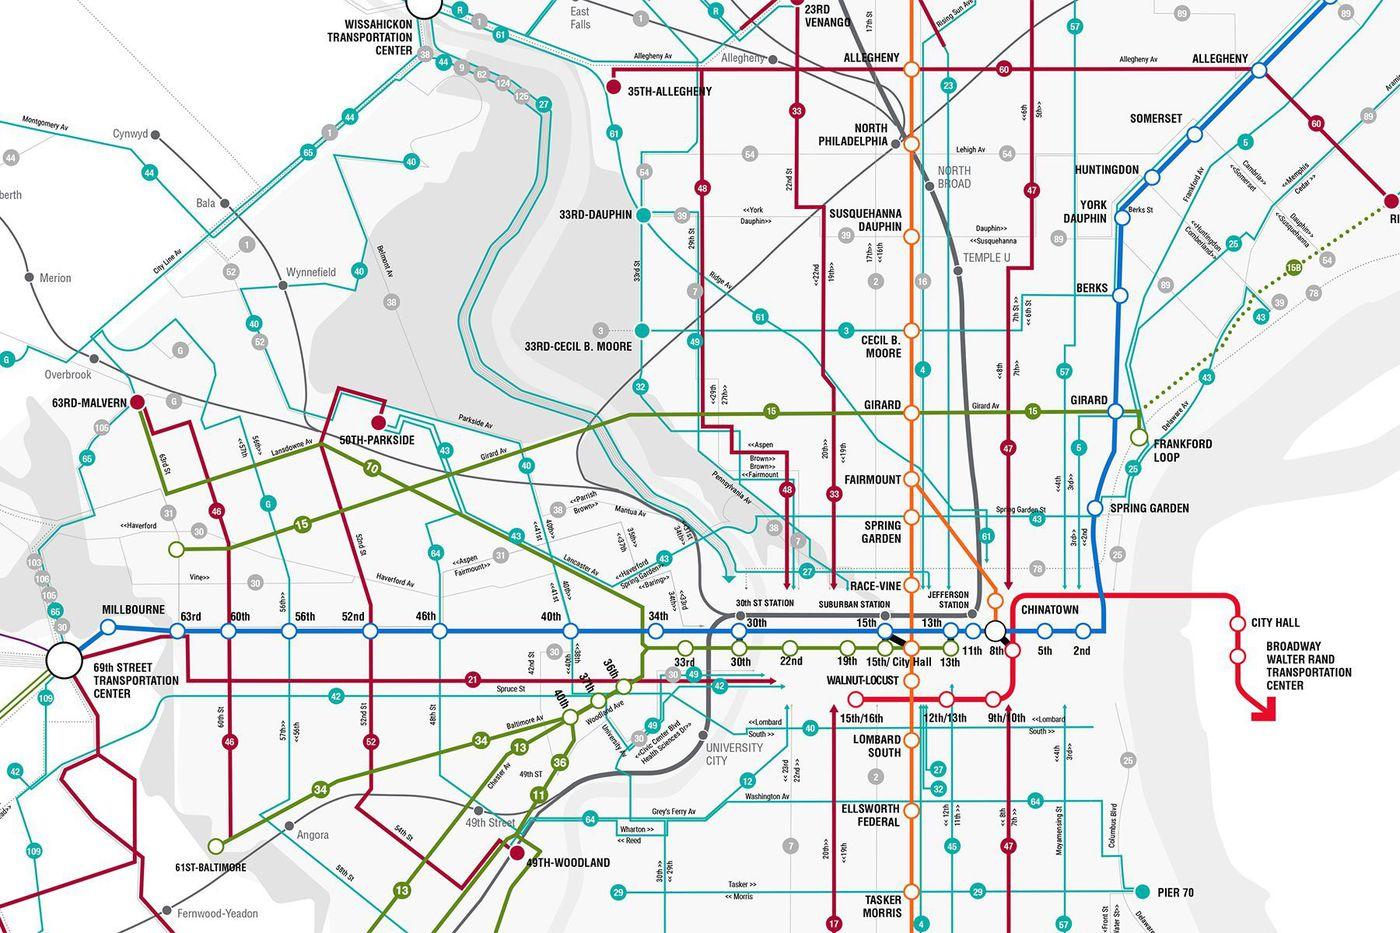 philadelphia public transportation map Septa Gives Its Bus Network Map An Upgrade philadelphia public transportation map